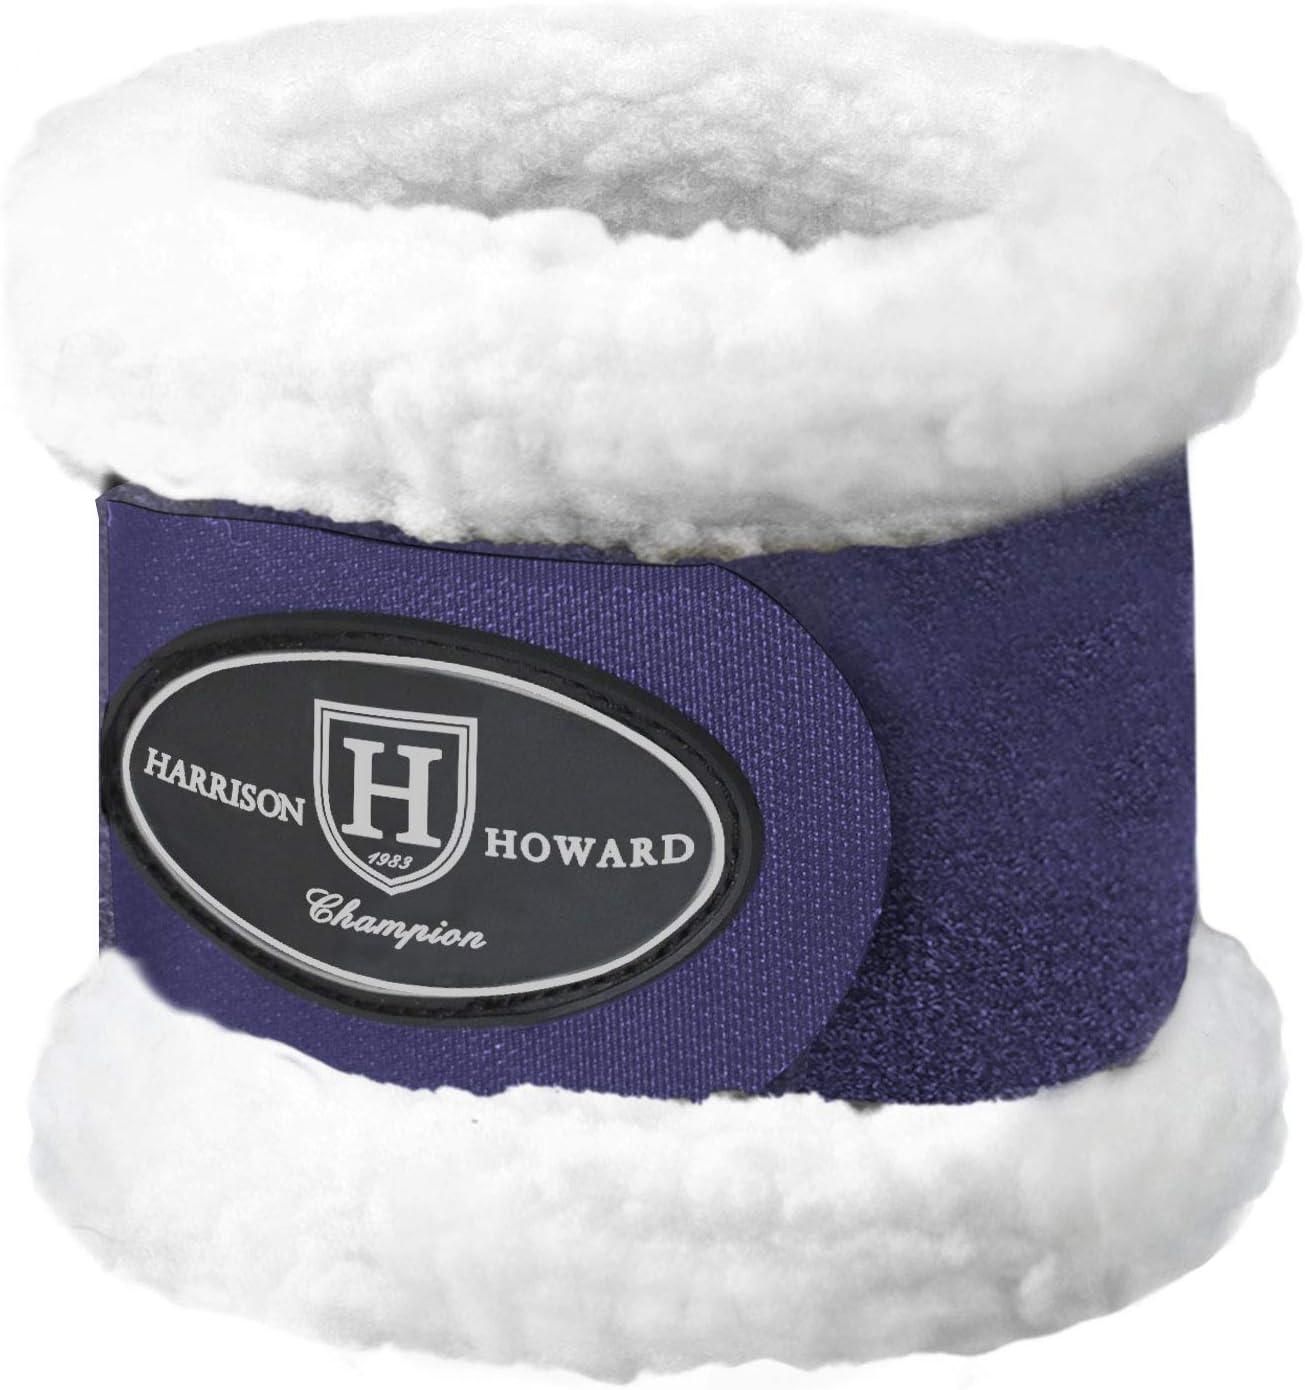 Harrison Howard Premium Horse Pastern Wraps with Berber Fleece Lining-Navy : Pet Supplies